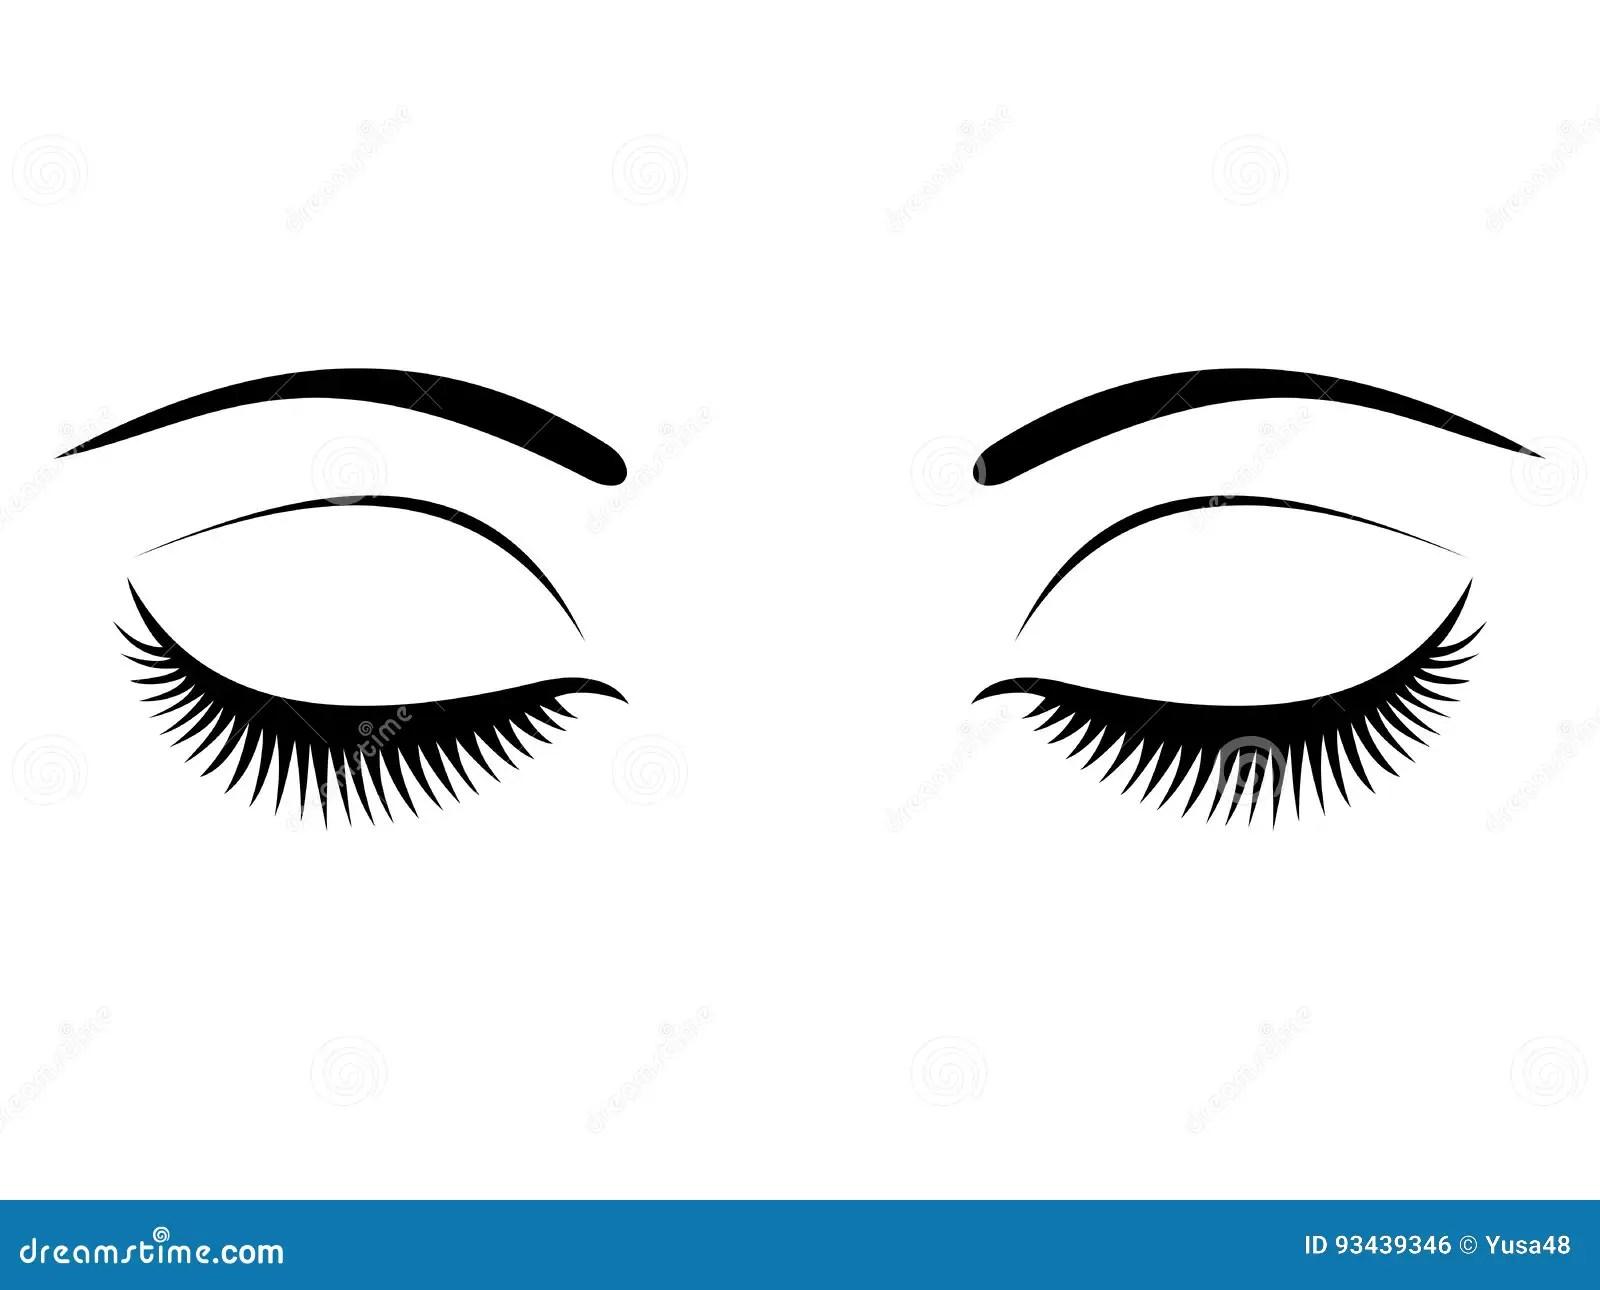 Eyelashes Cartoons, Illustrations & Vector Stock Images